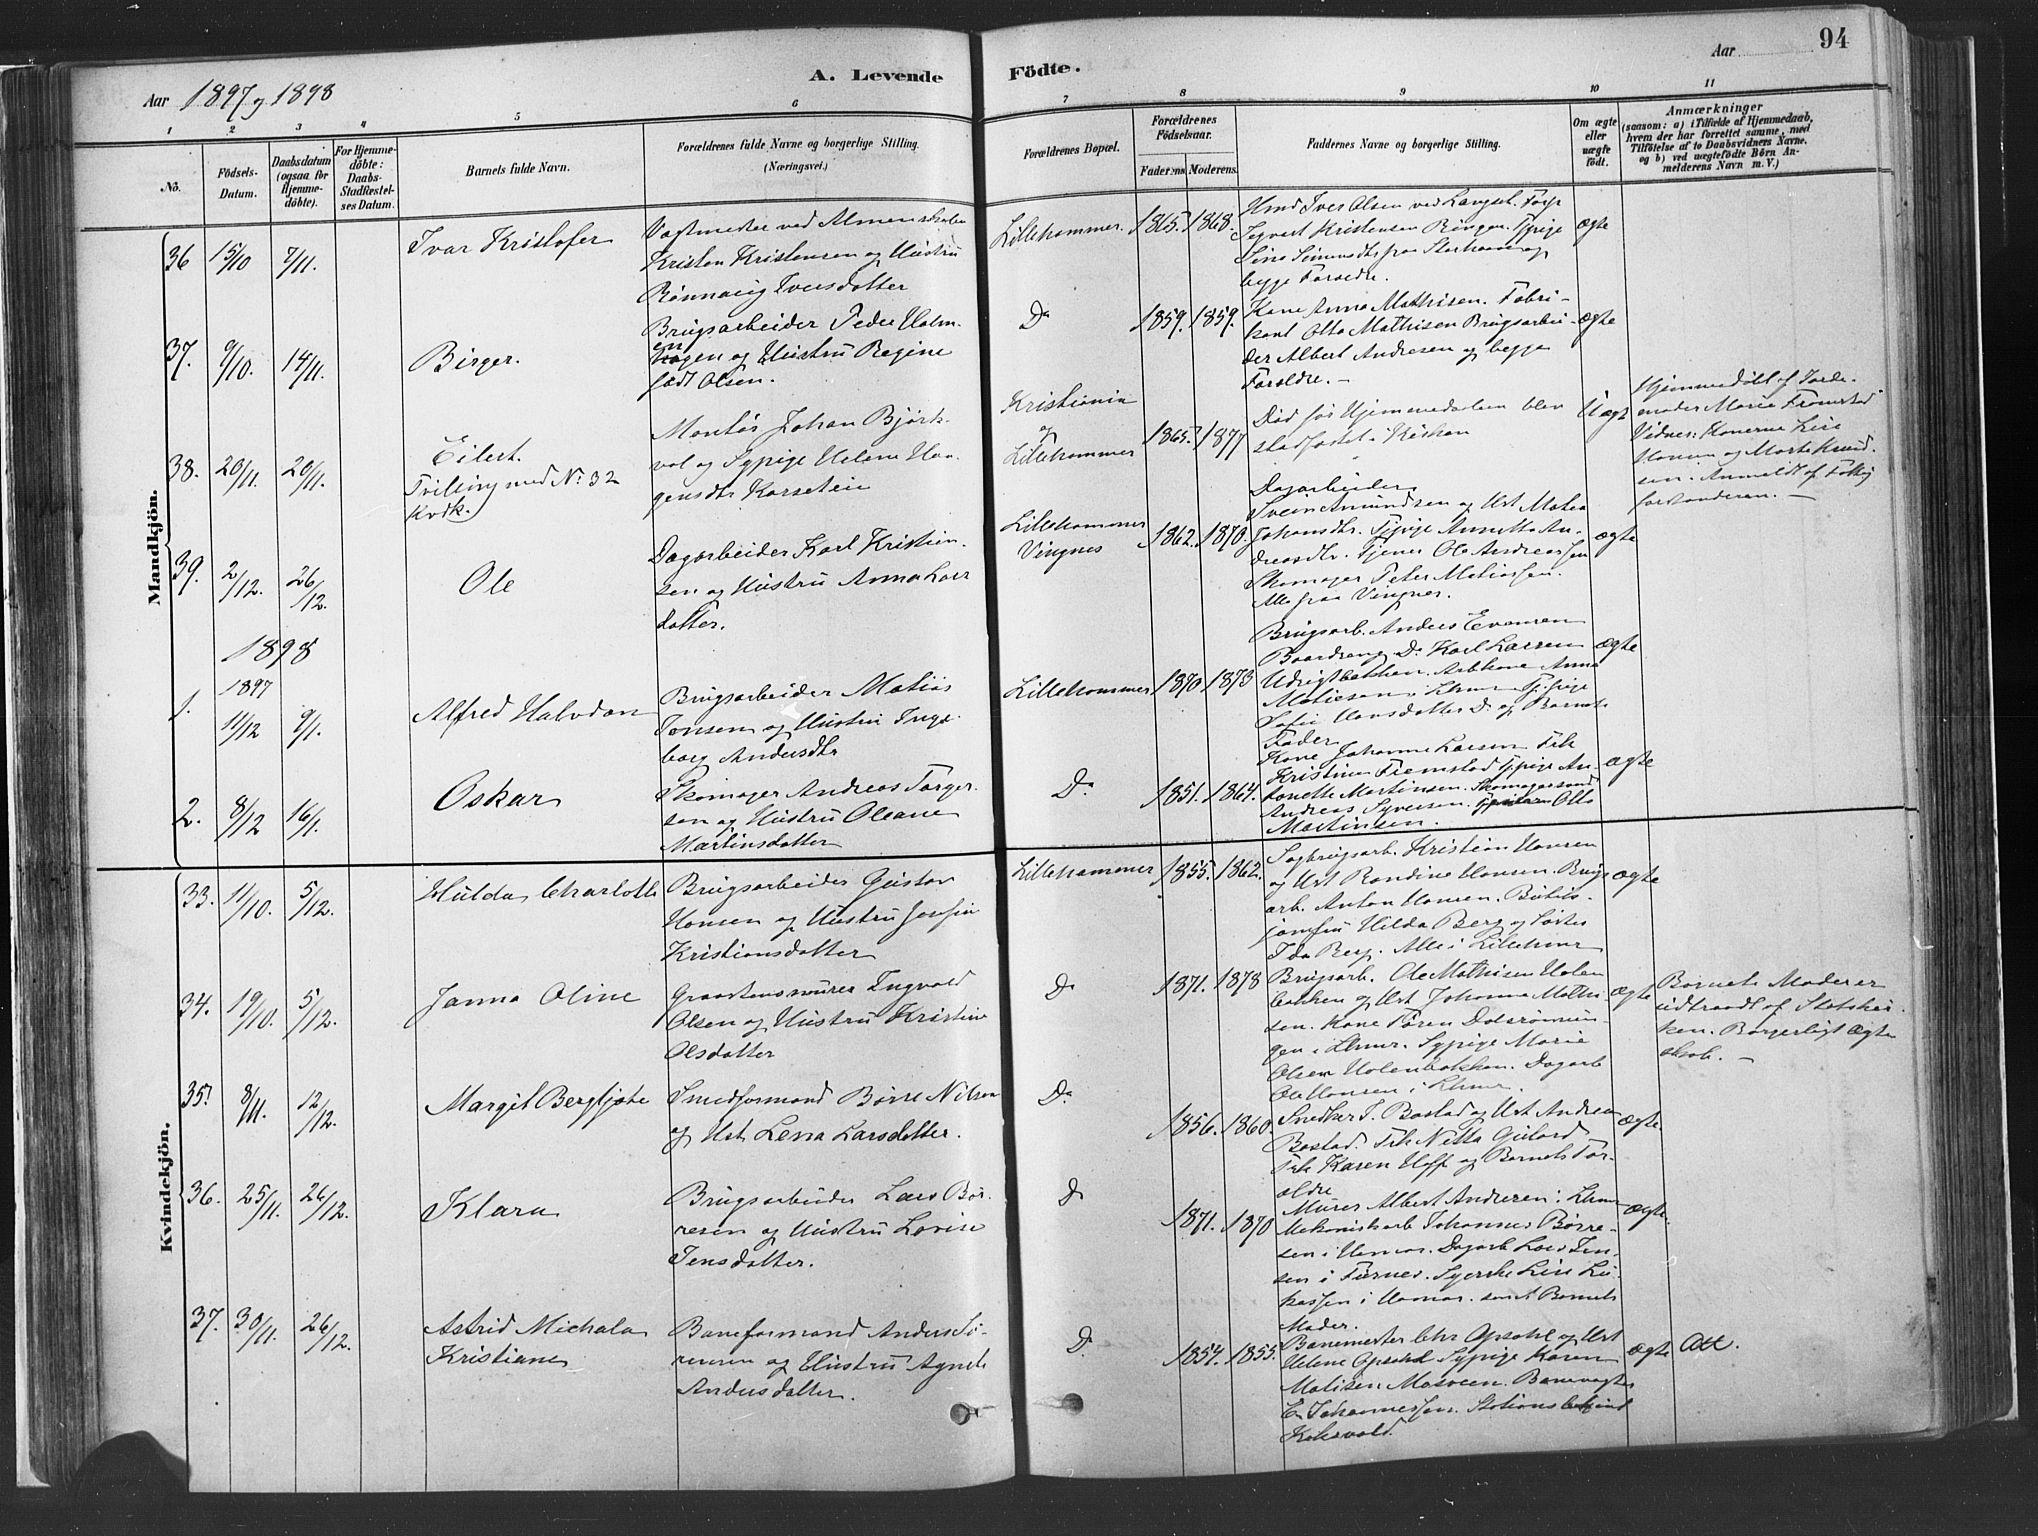 SAH, Fåberg prestekontor, Ministerialbok nr. 10, 1879-1900, s. 94